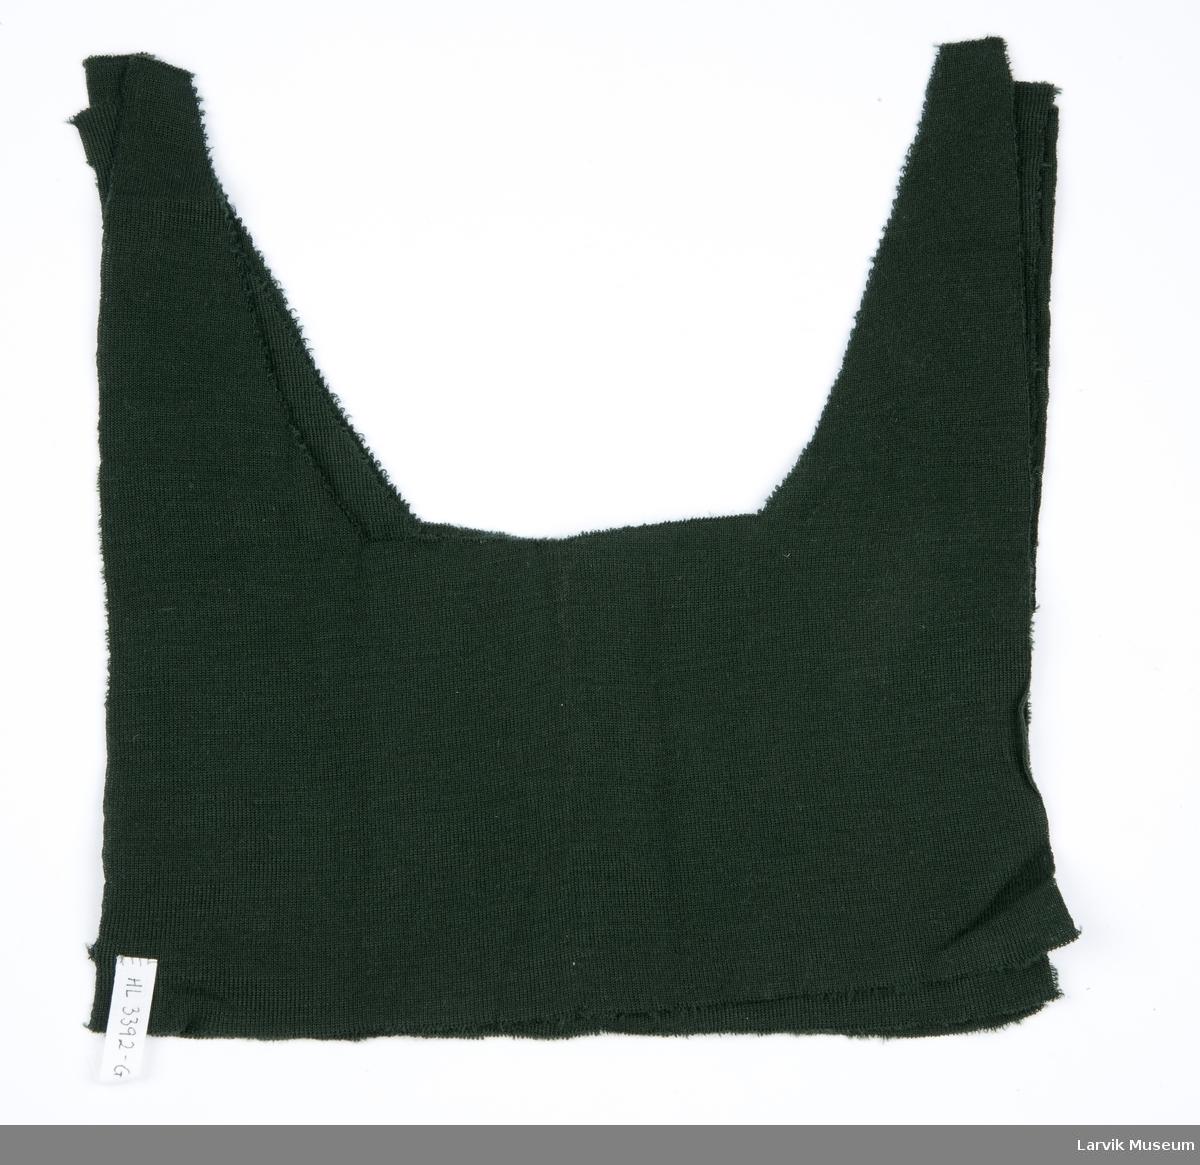 3 stk. bærestykker med halsåpning